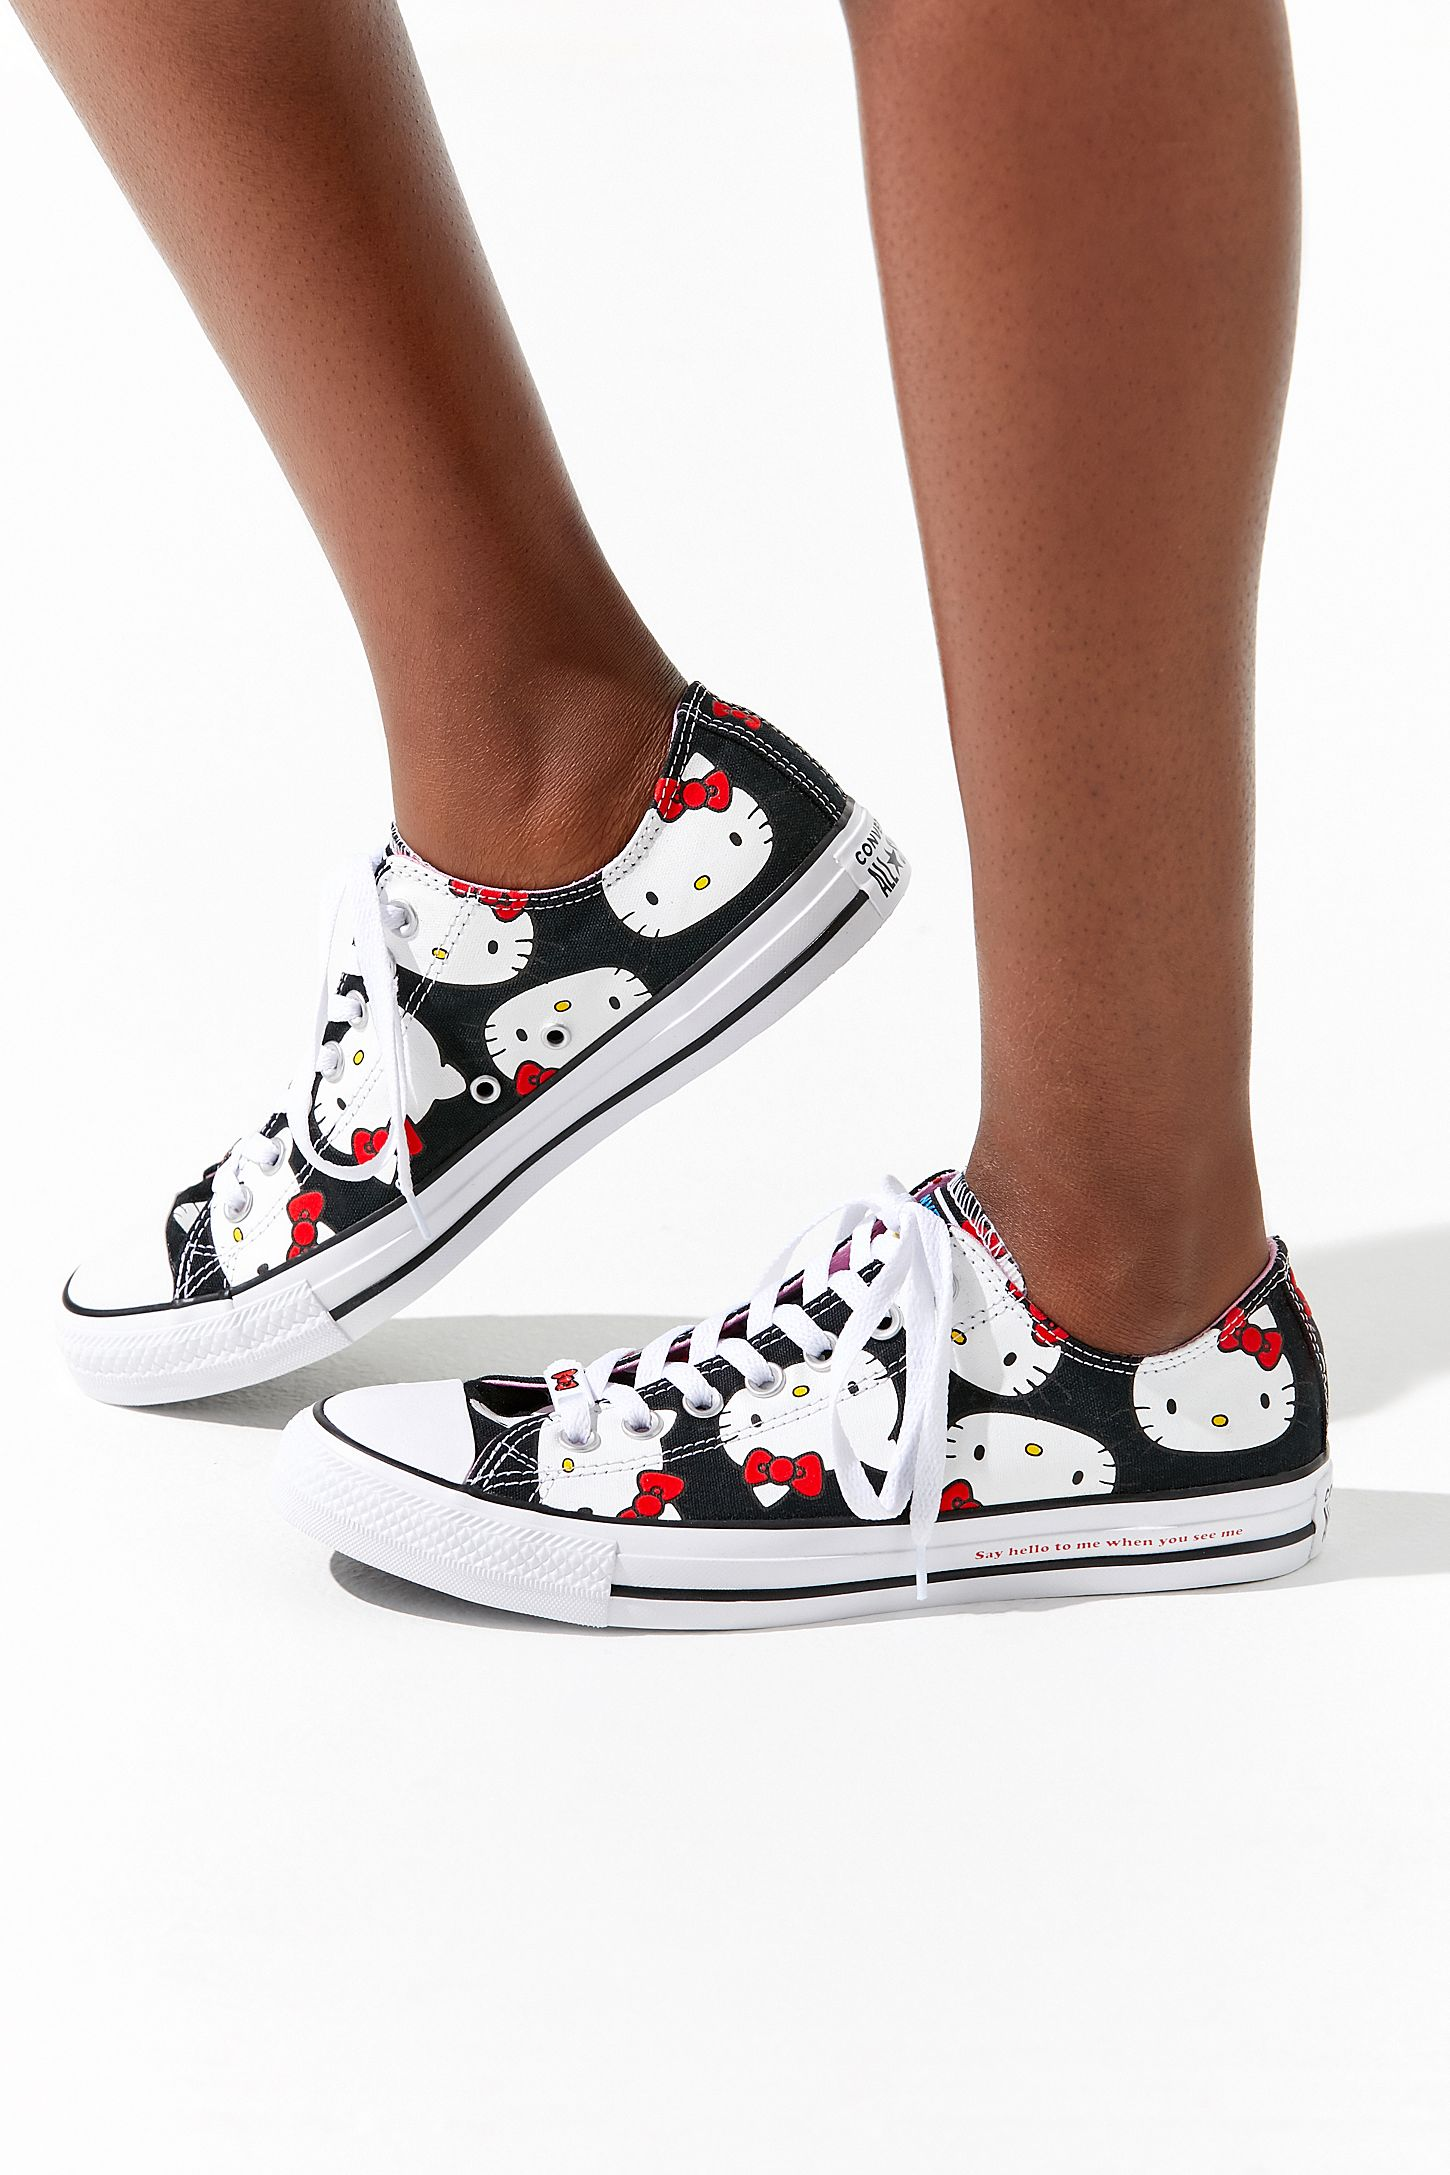 0a52ad6b8 Converse X Hello Kitty Chuck Taylor All Star Low Top Sneaker | Urban ...